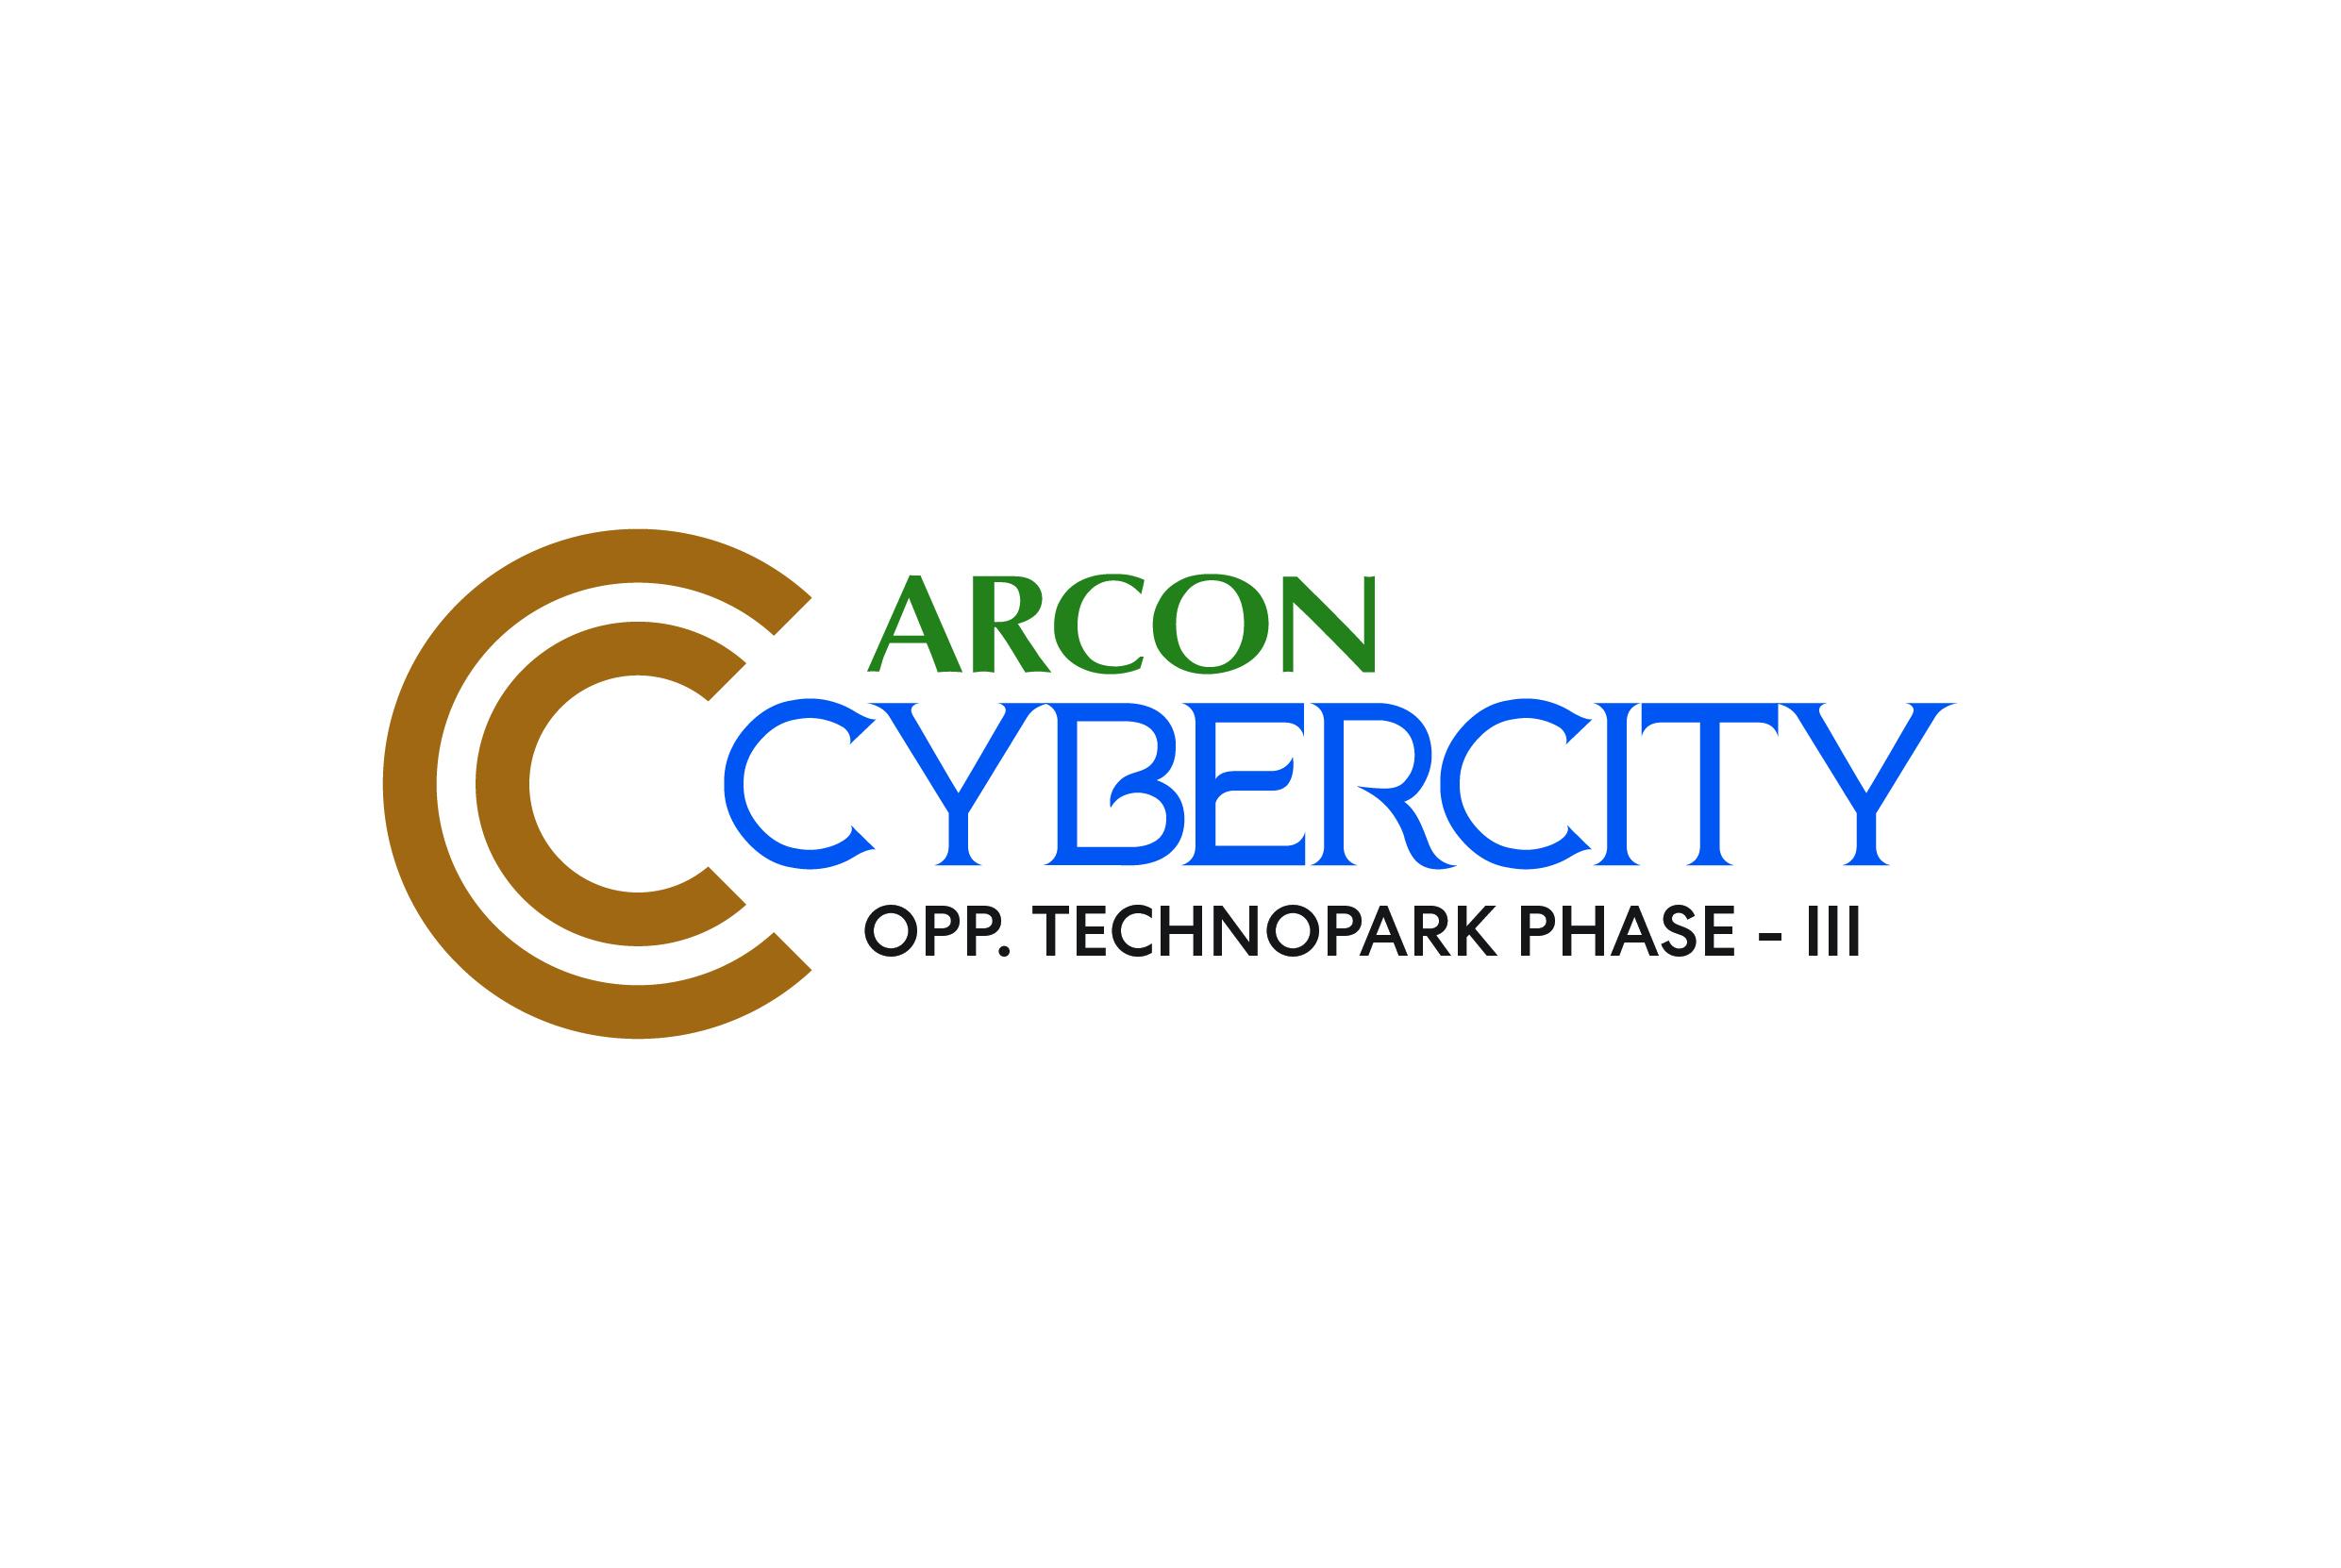 LOGO - Arcon Cybercity